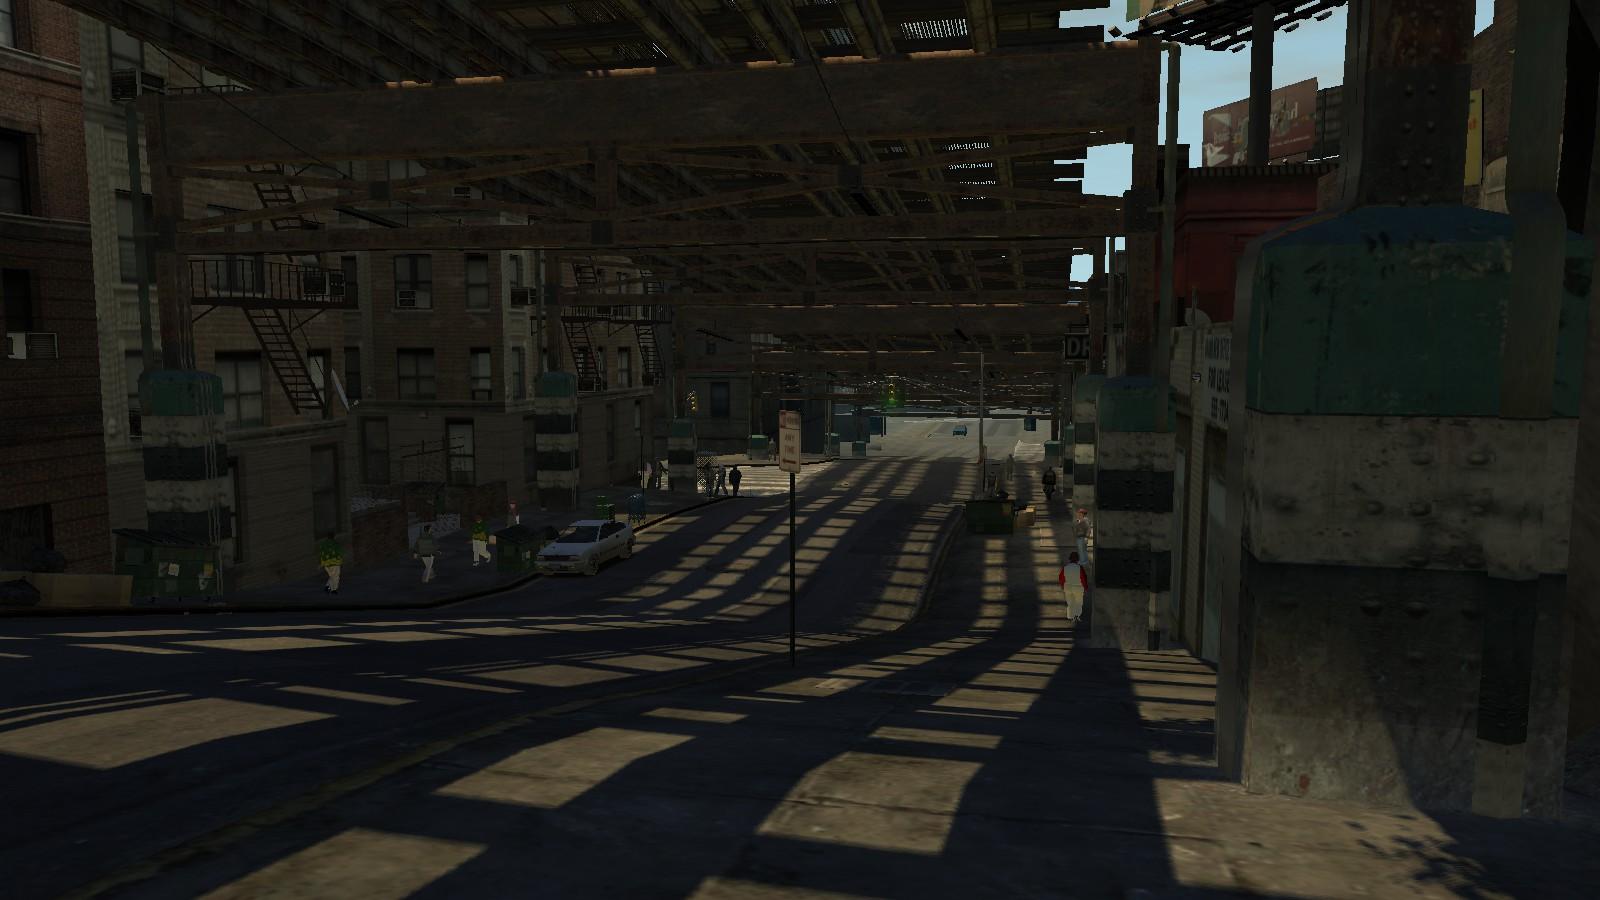 Applejack Street